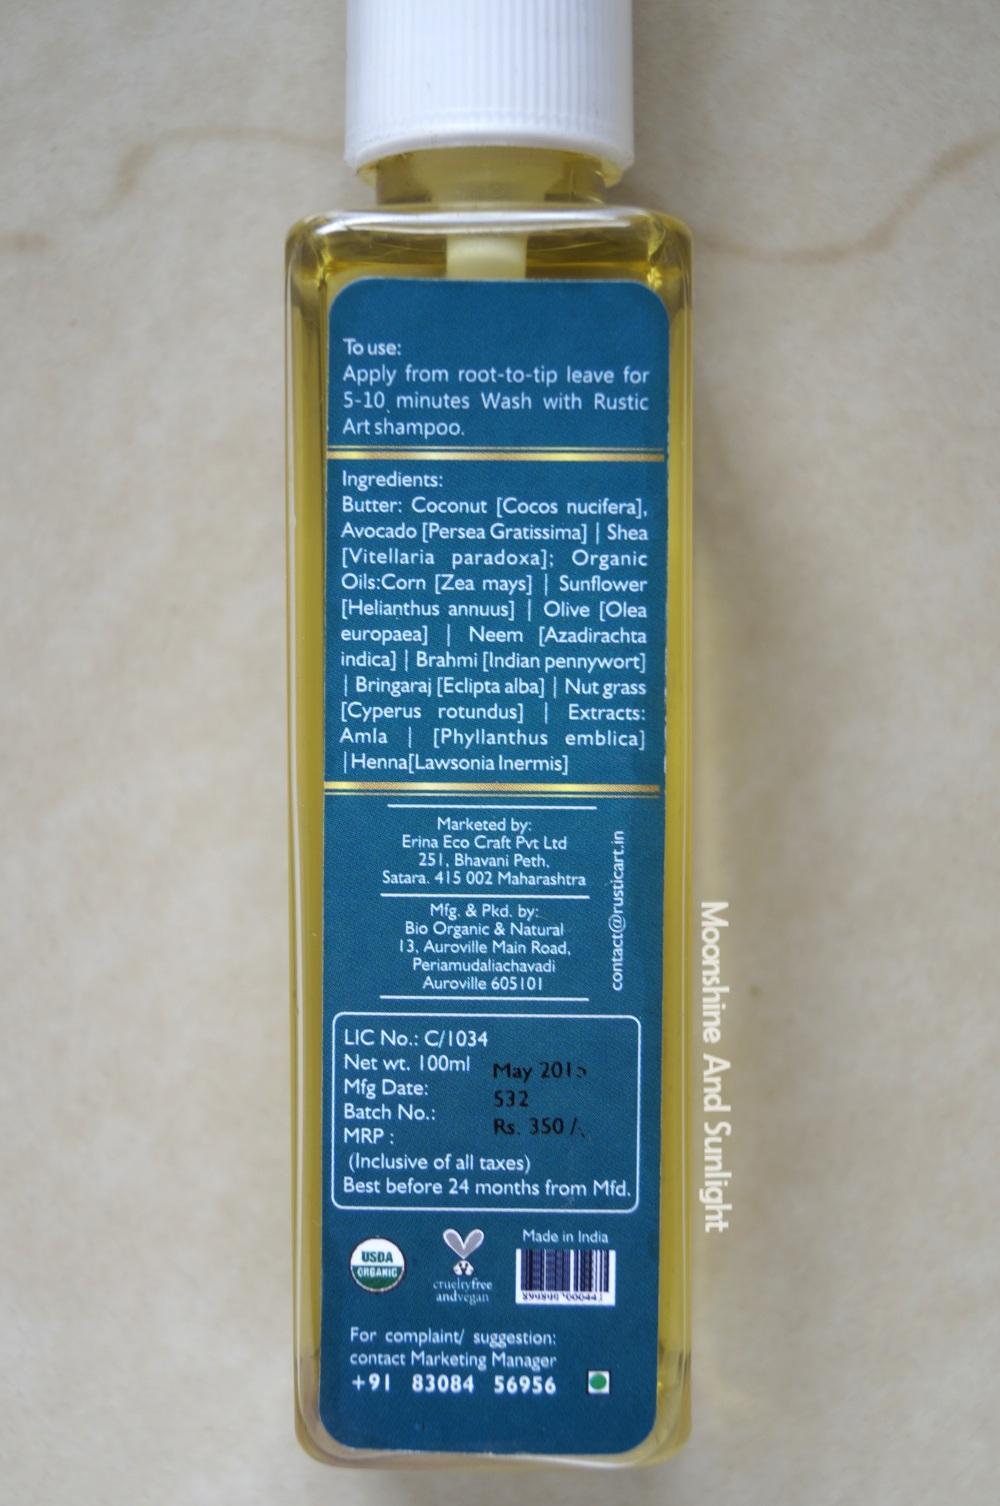 Rustic Art Vitality Pre shampoo Deep Conditioner   Review